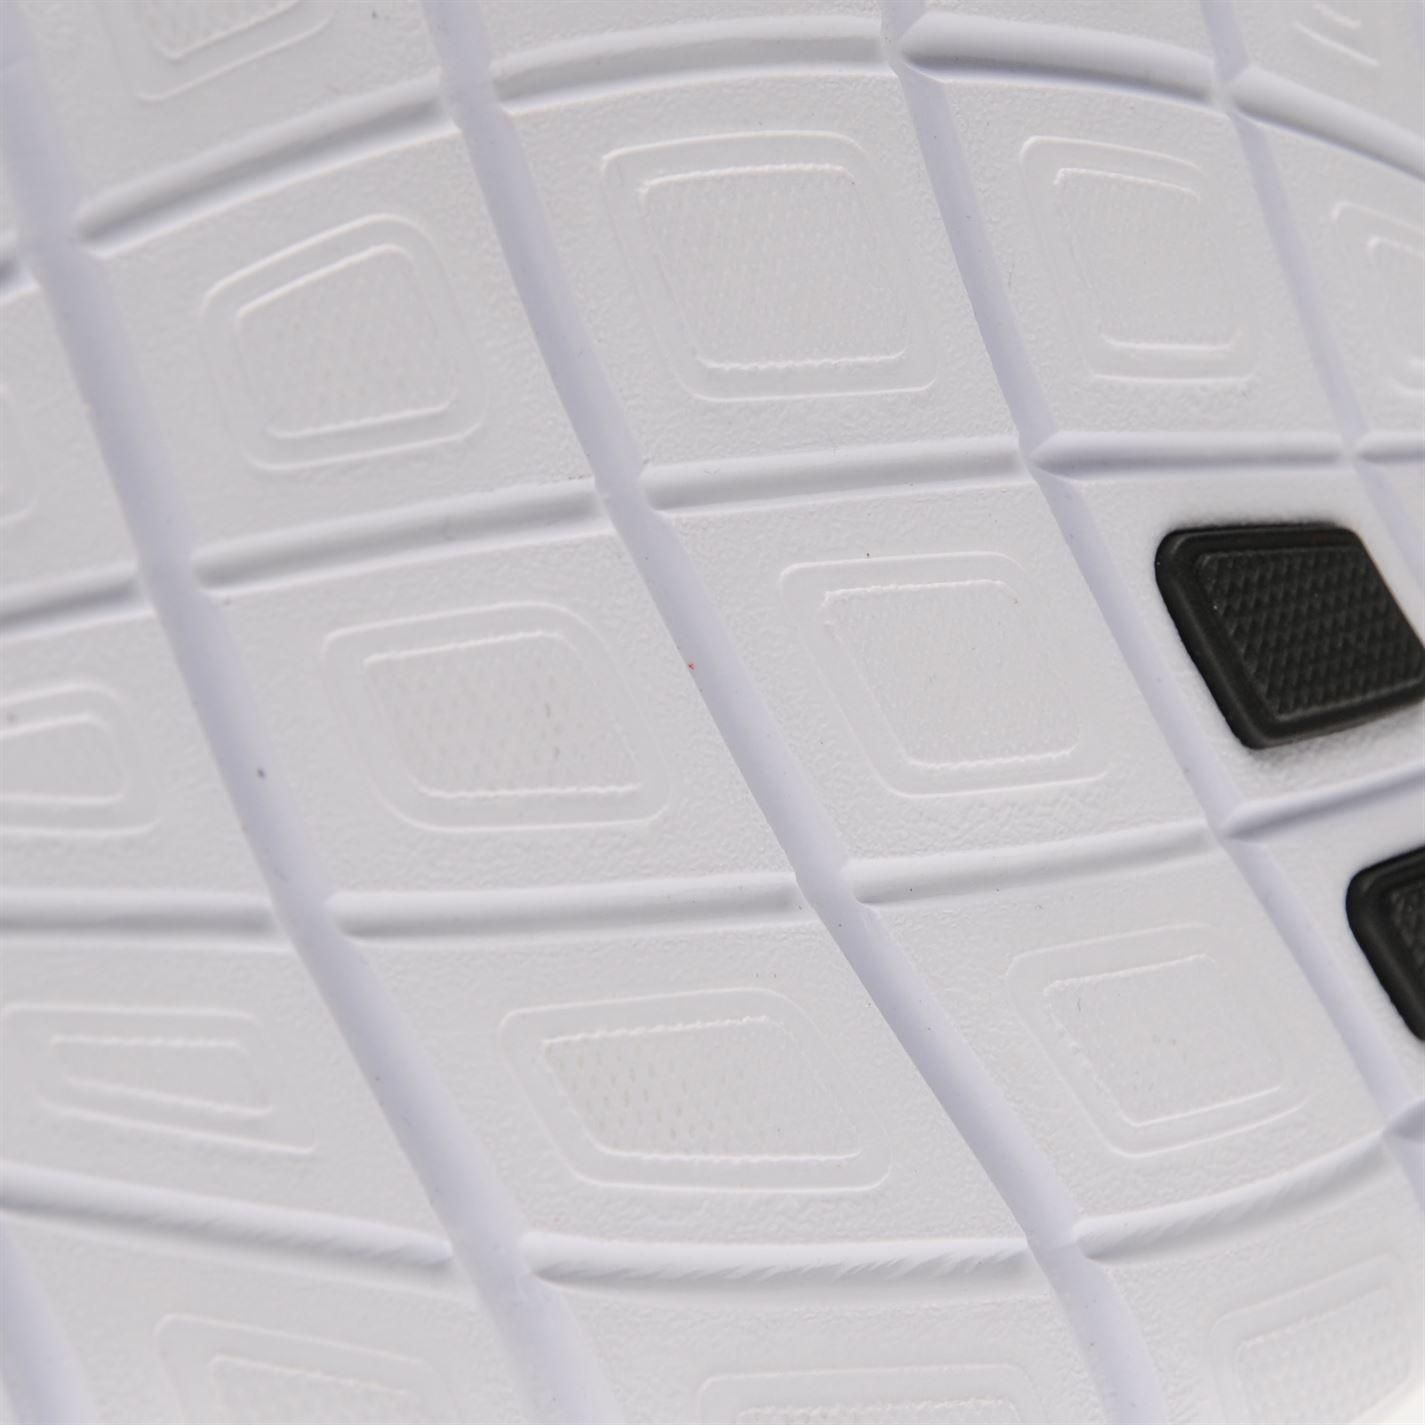 Karrimor-Mens-Duma-Trainers-Lace-Up-Sports-Running-Cross-Training-Shoes thumbnail 18